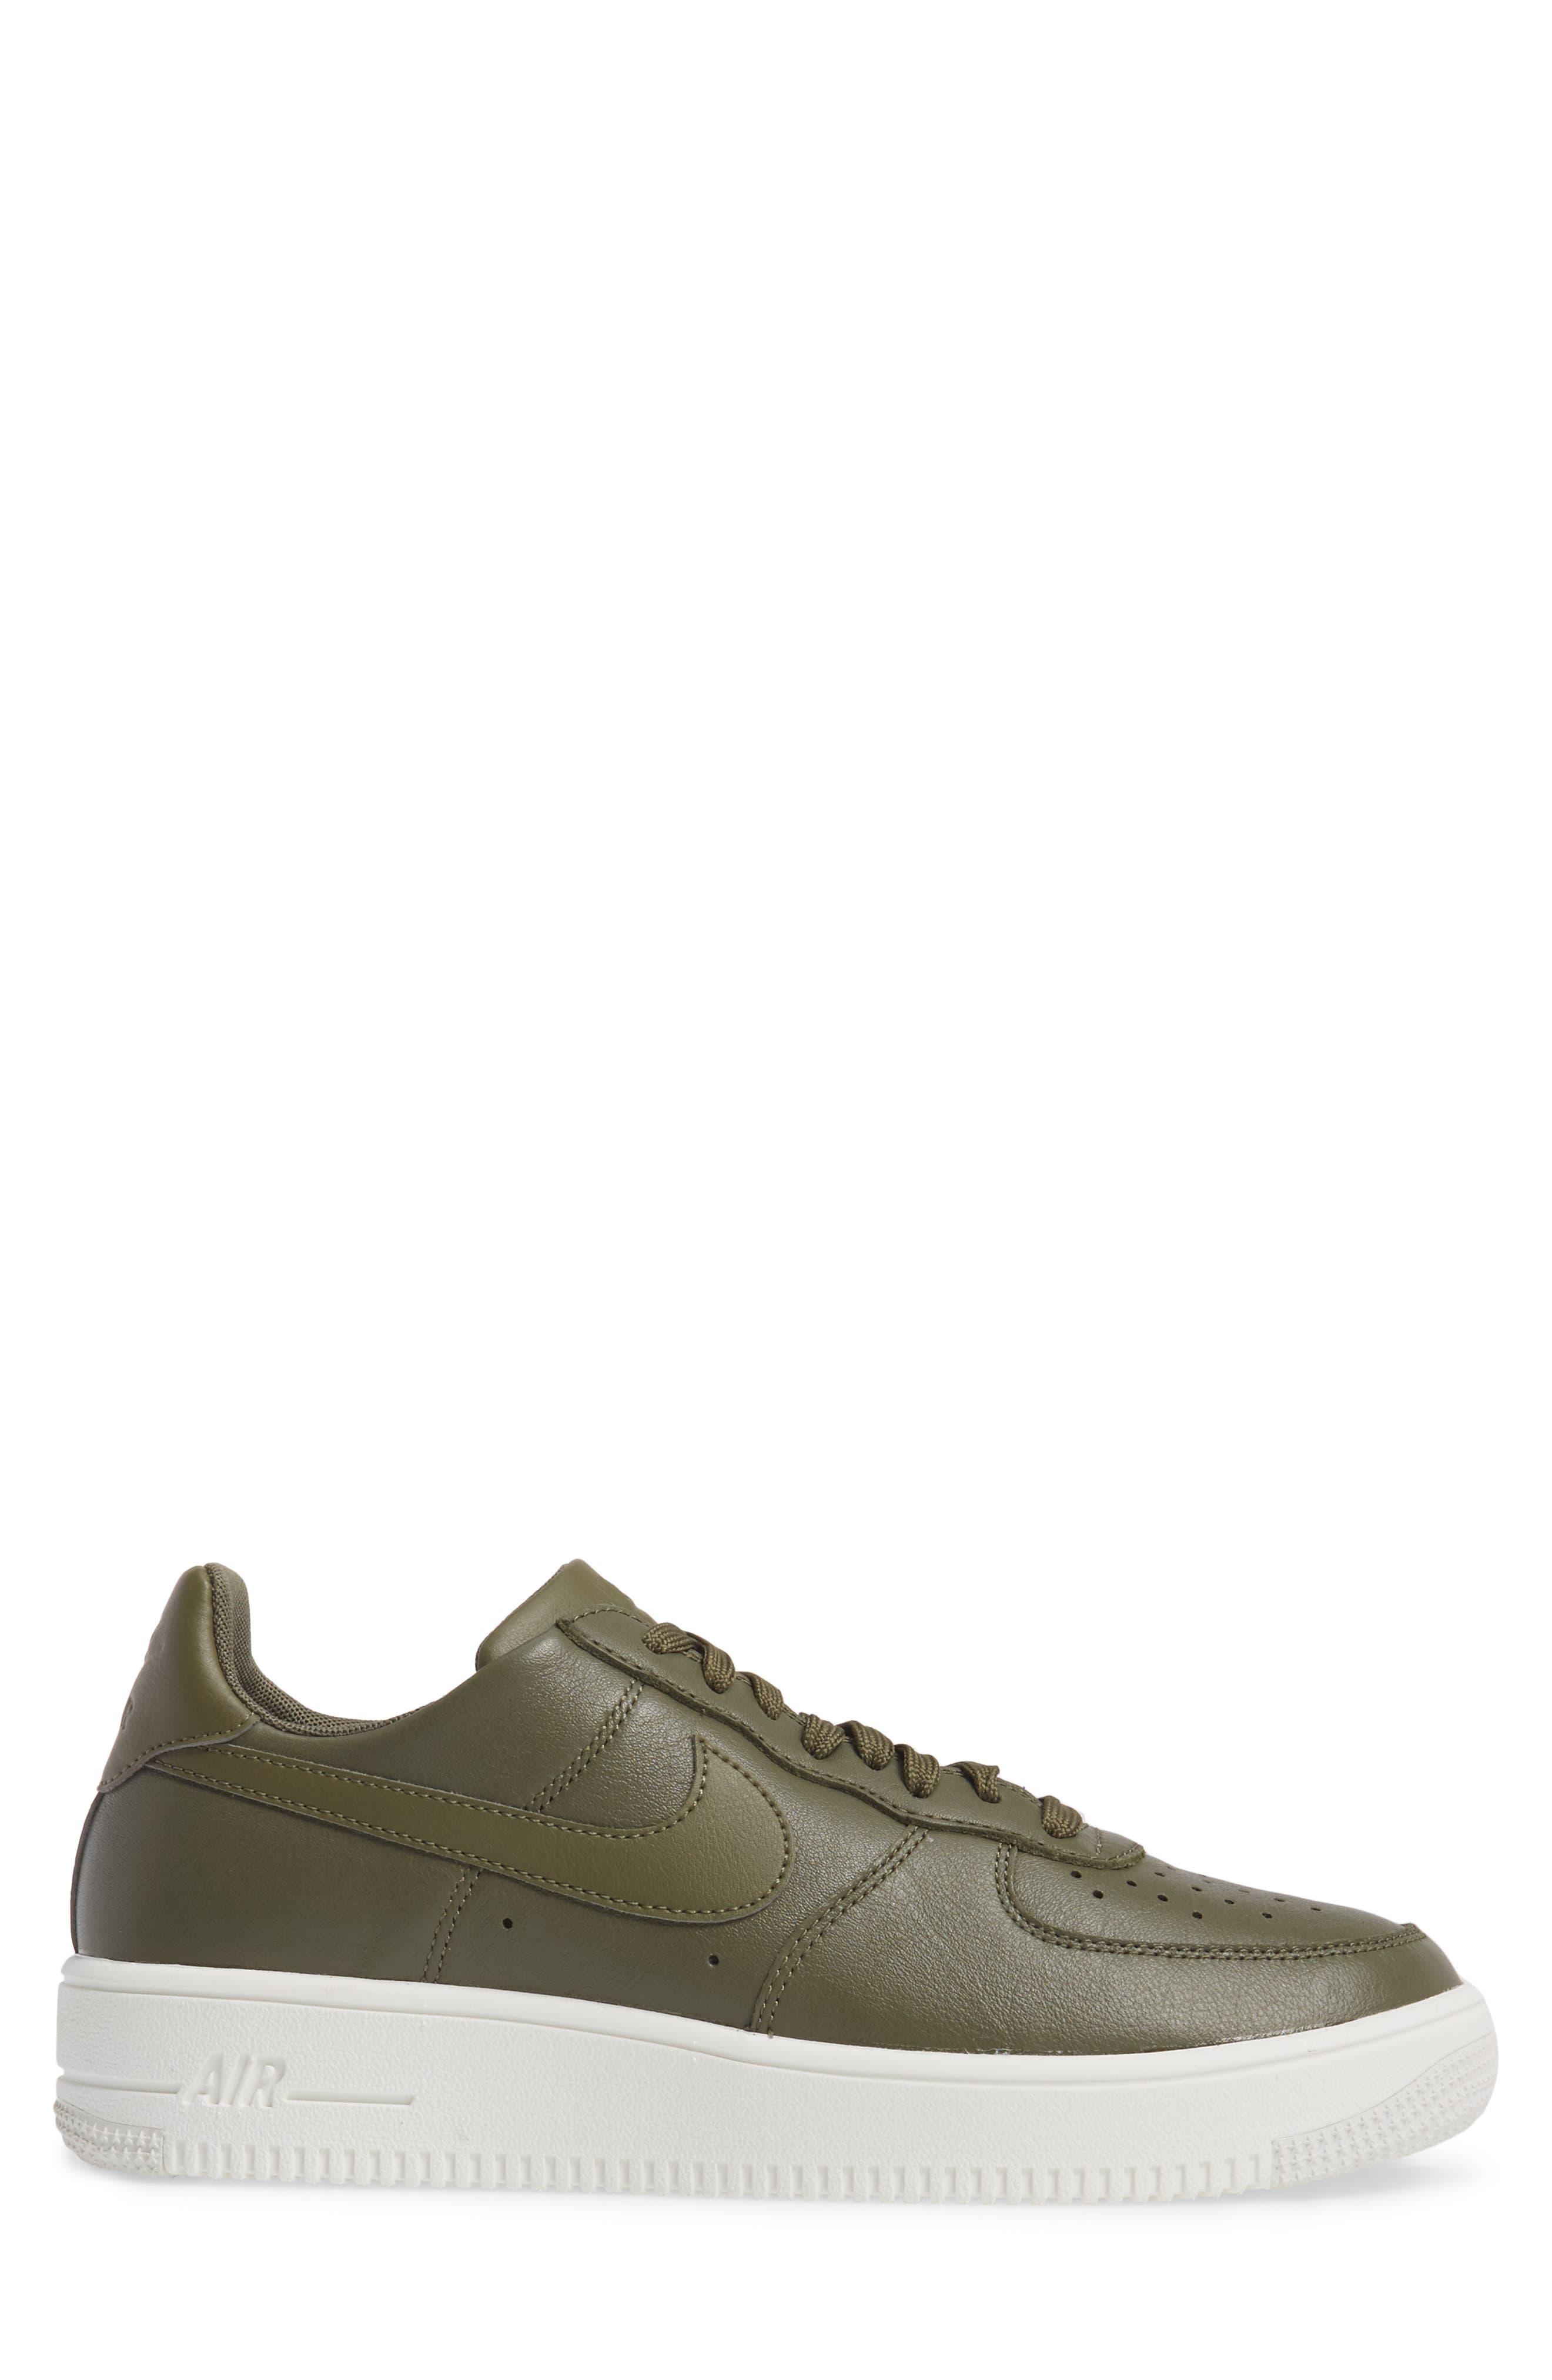 Air Force 1 Ultraforce Sneaker,                             Alternate thumbnail 12, color,